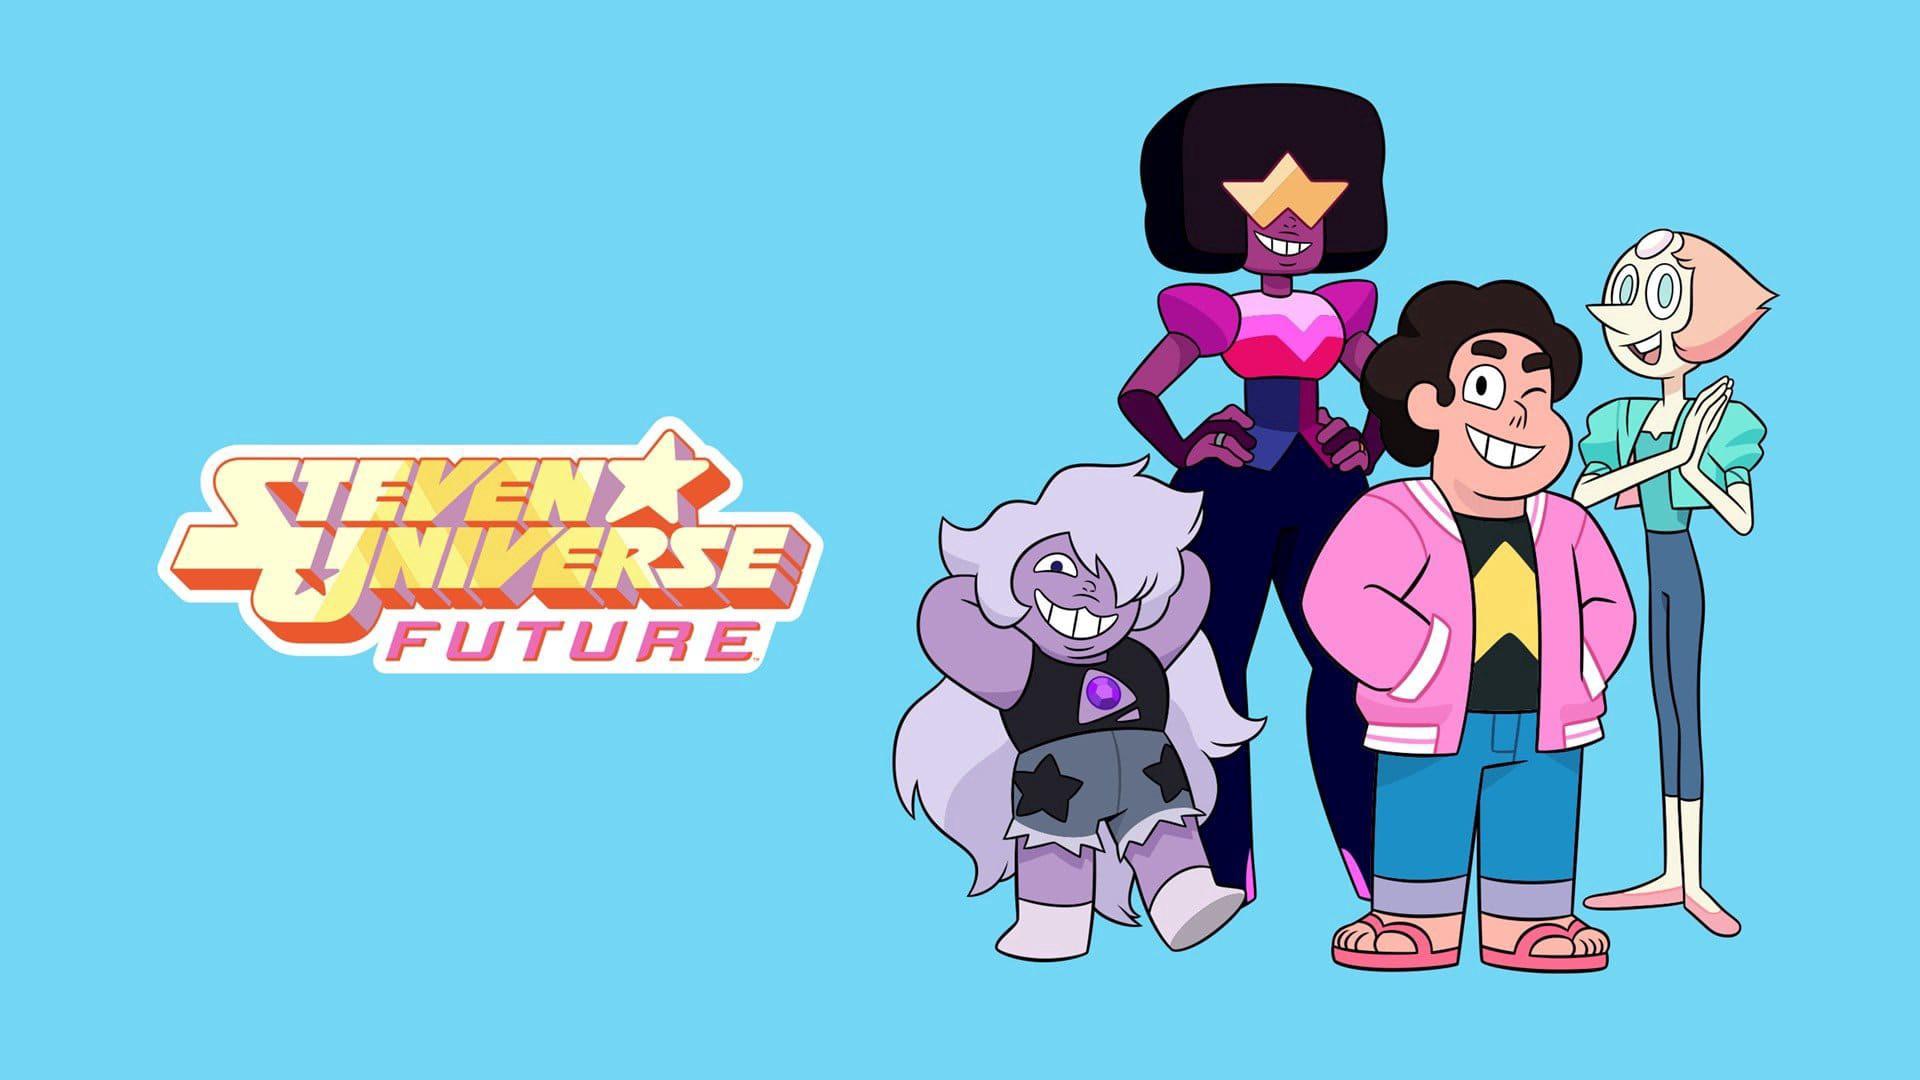 Steven Universe Future Episode 20 Season Finale Release Date